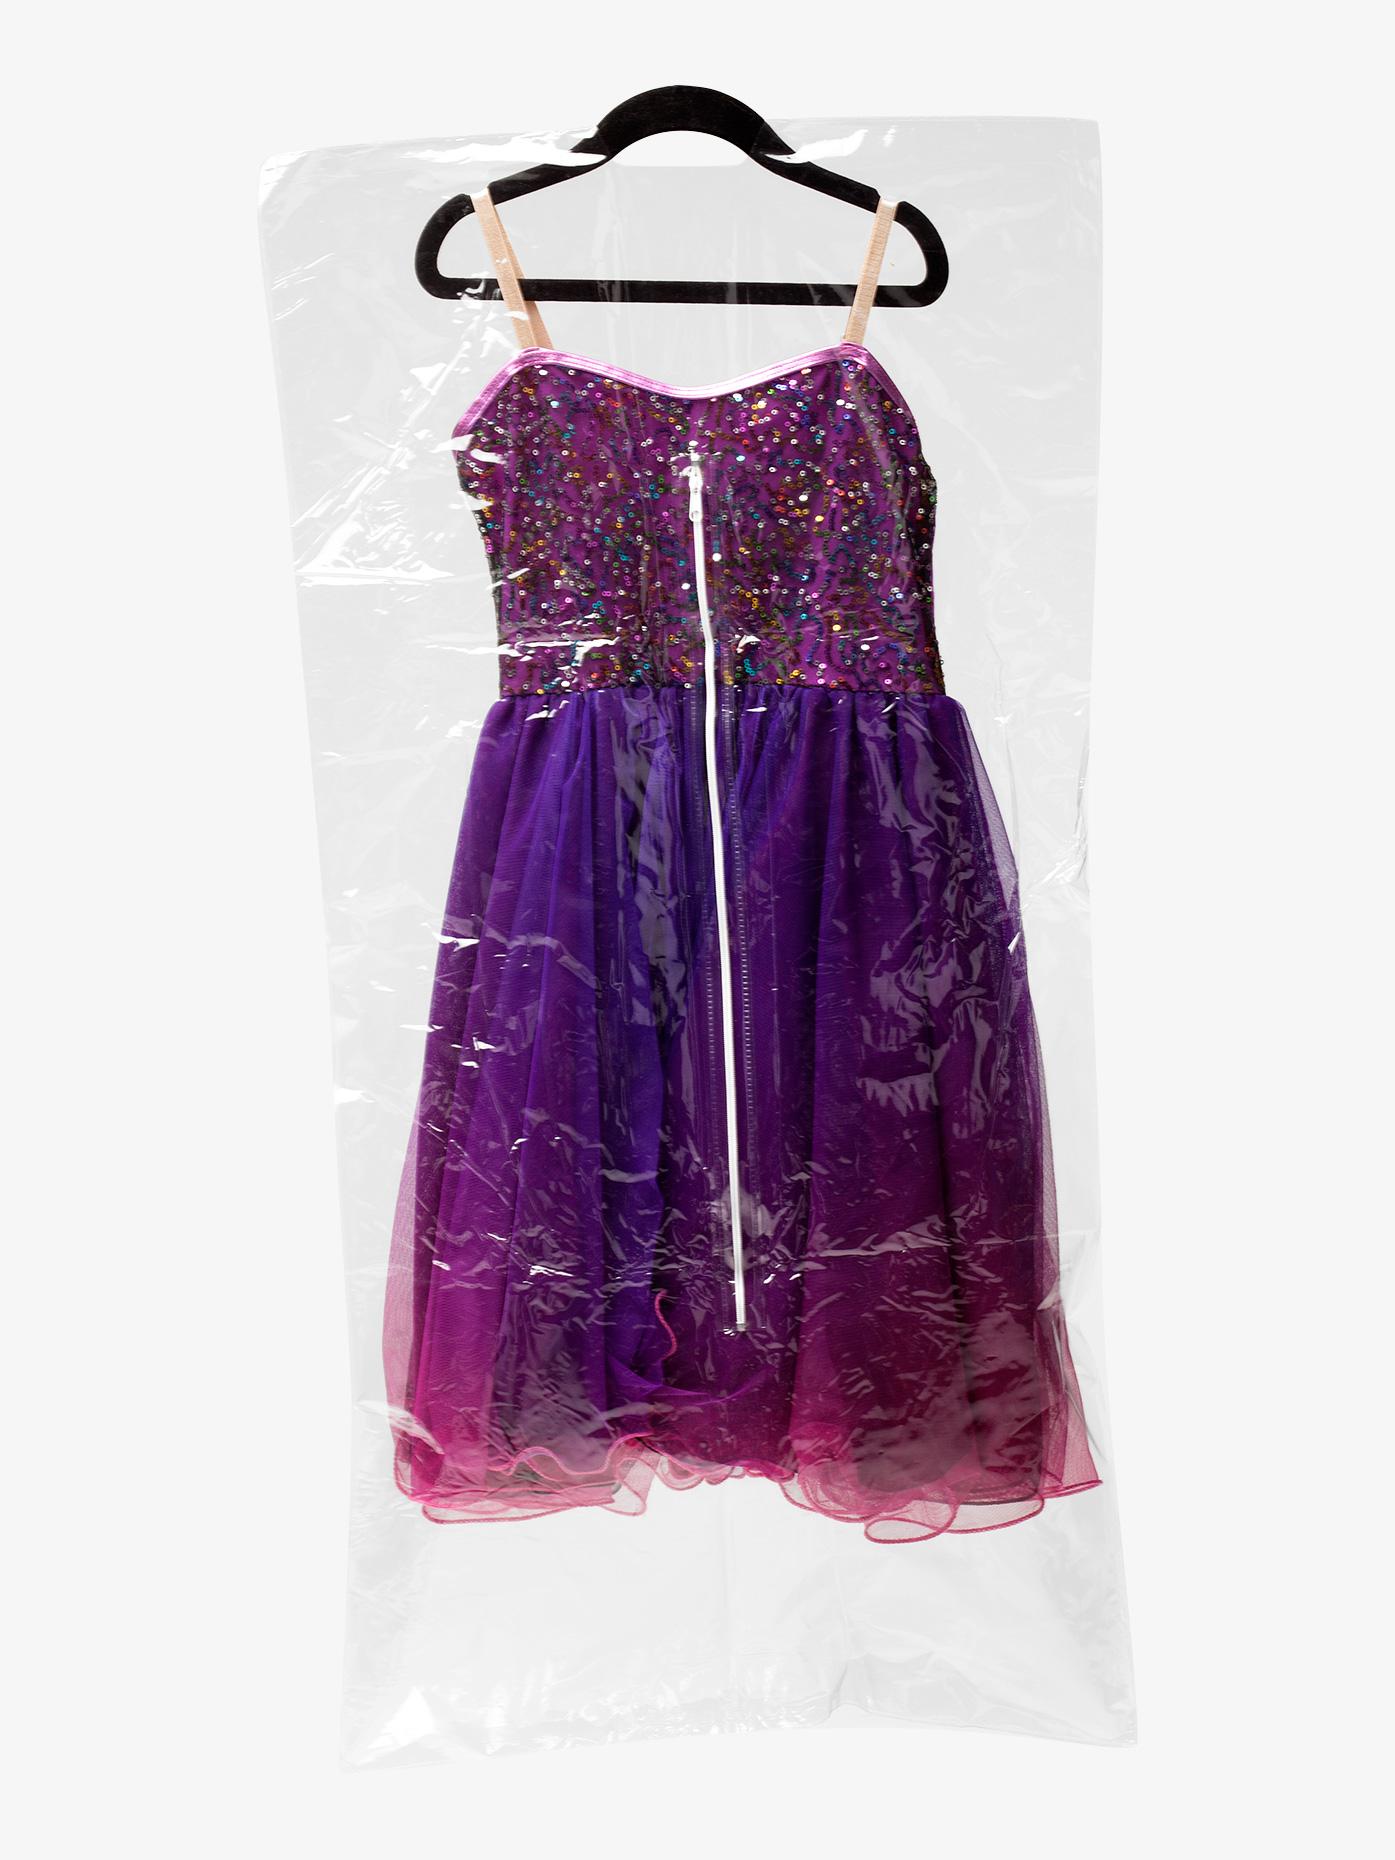 Double Platinum Small Costume Garment Bag THBAGS